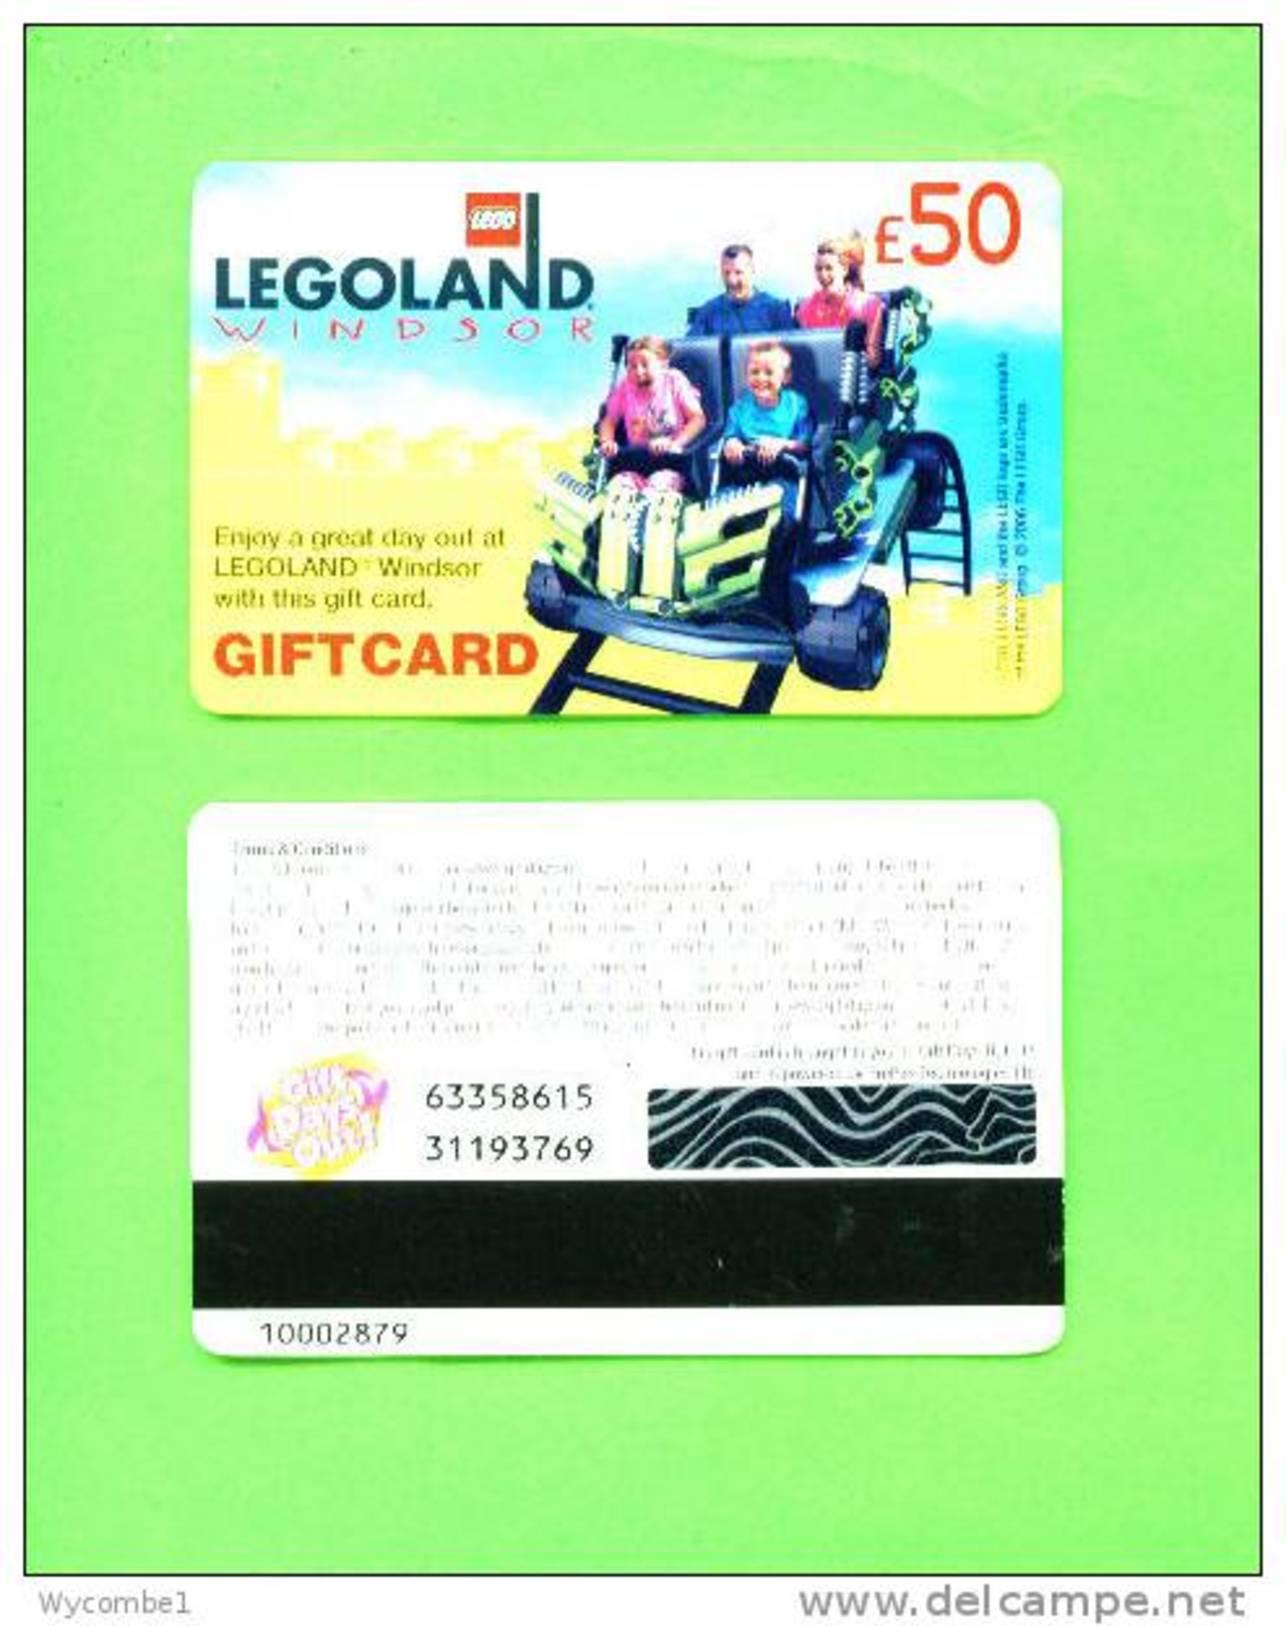 UK - Magnetic Gift Card/Legoland £50 - Unclassified